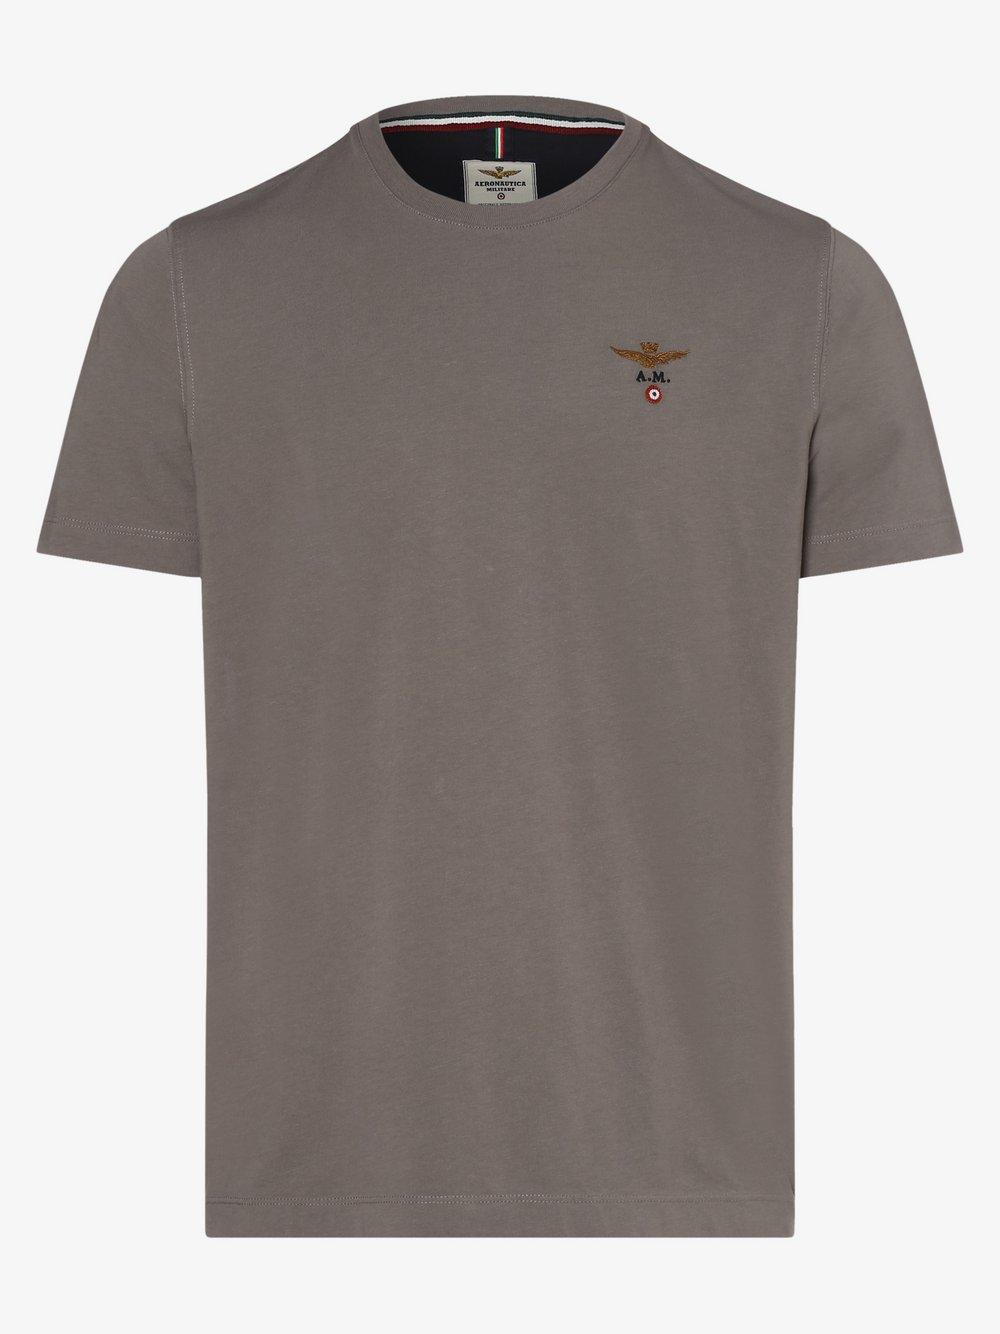 Aeronautica – T-shirt męski, szary Van Graaf 468435-0003